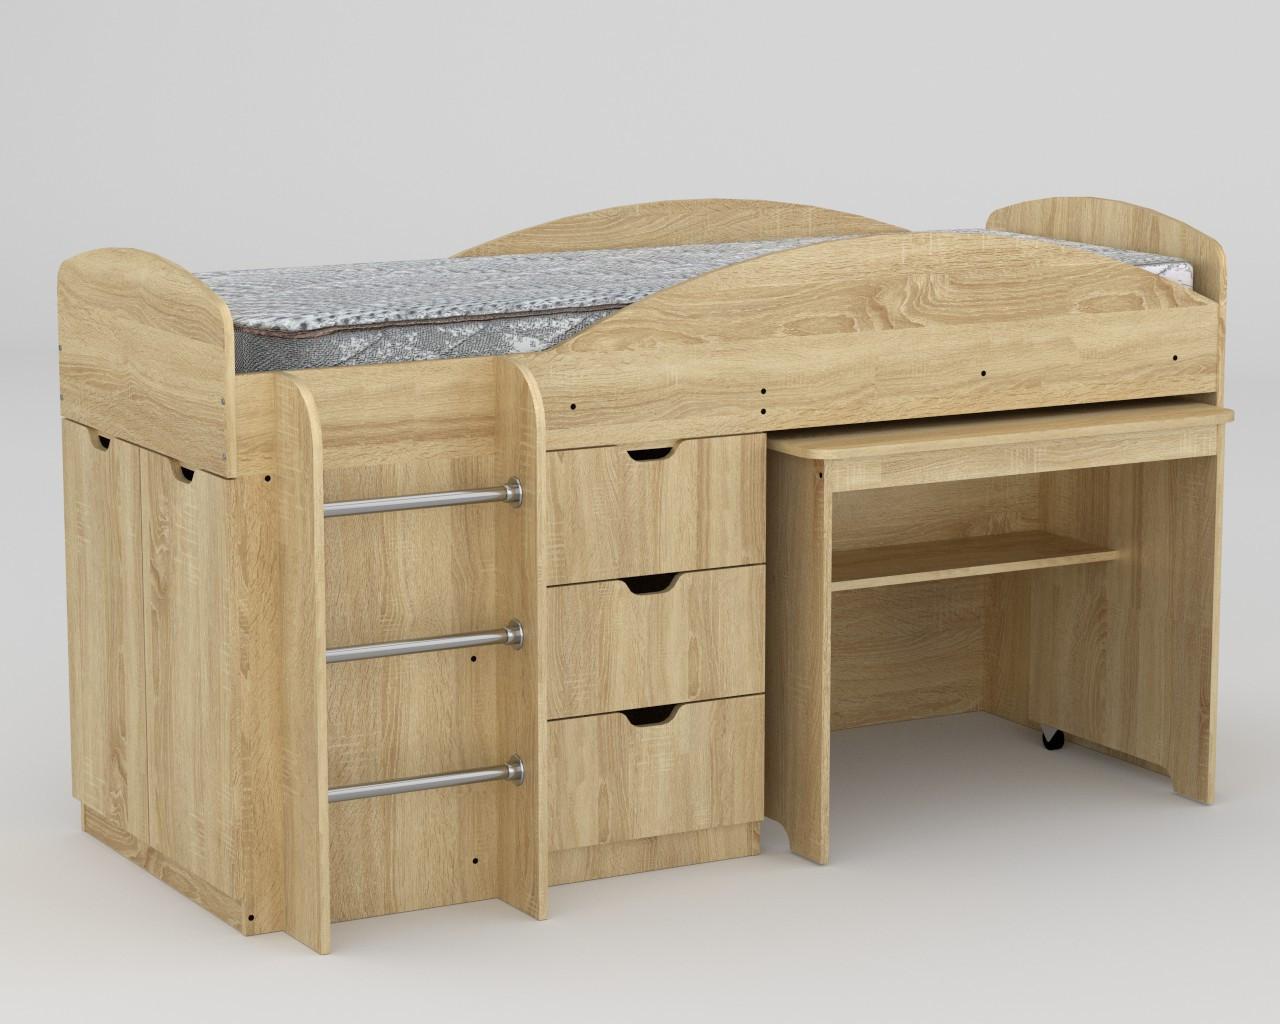 Кровать Универсал дуб сонома компанит (194х89х106 см)